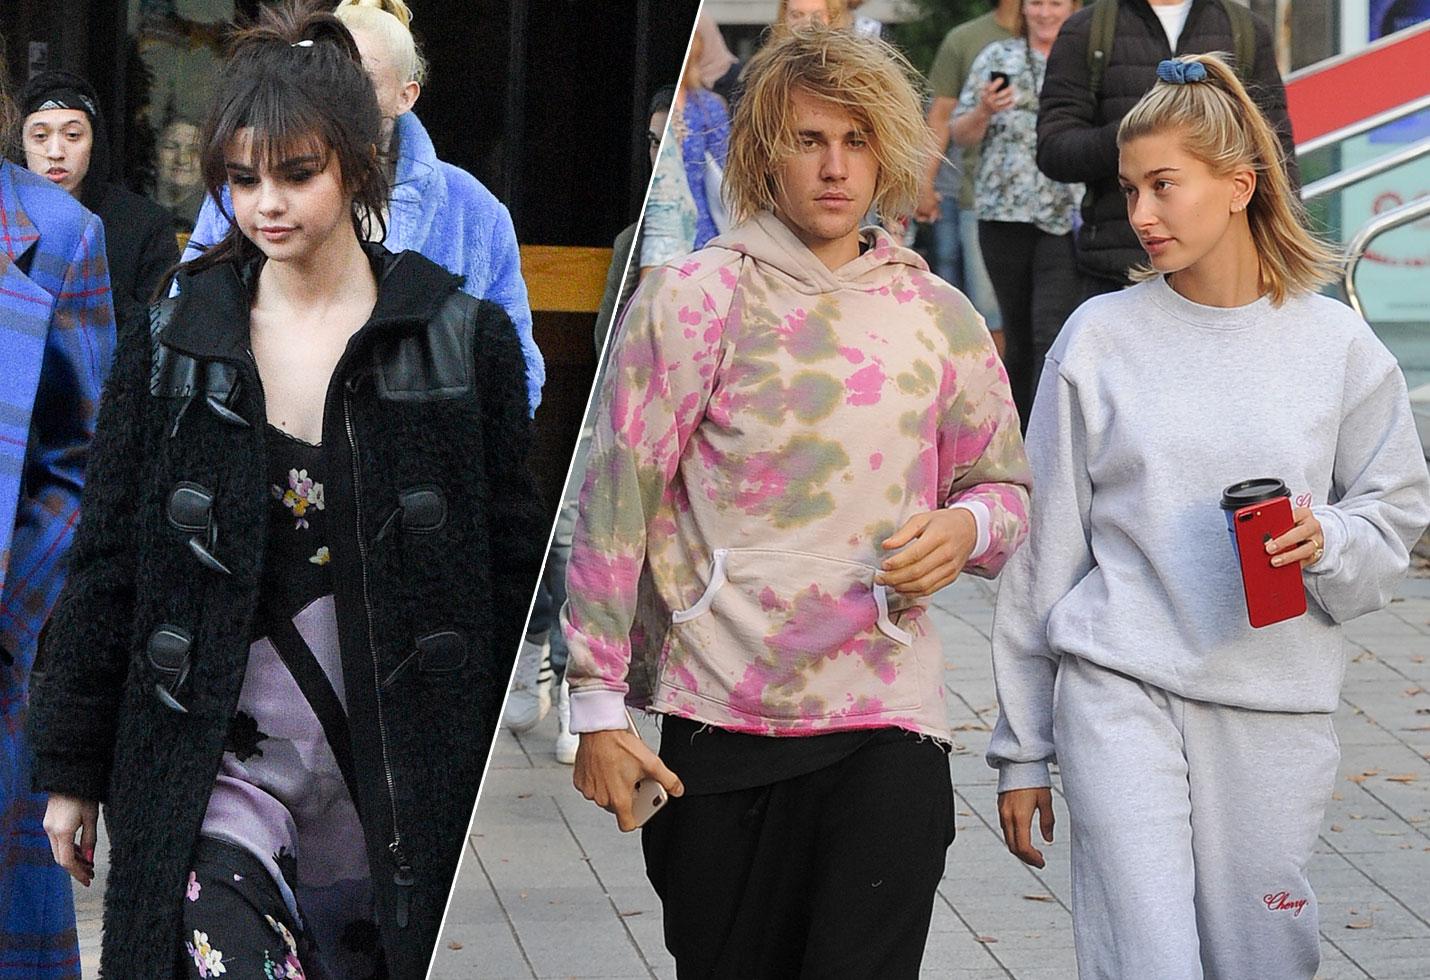 Hailey Baldwin Selena Gomez Hospitalized Fans Death Threats Justin Bieber